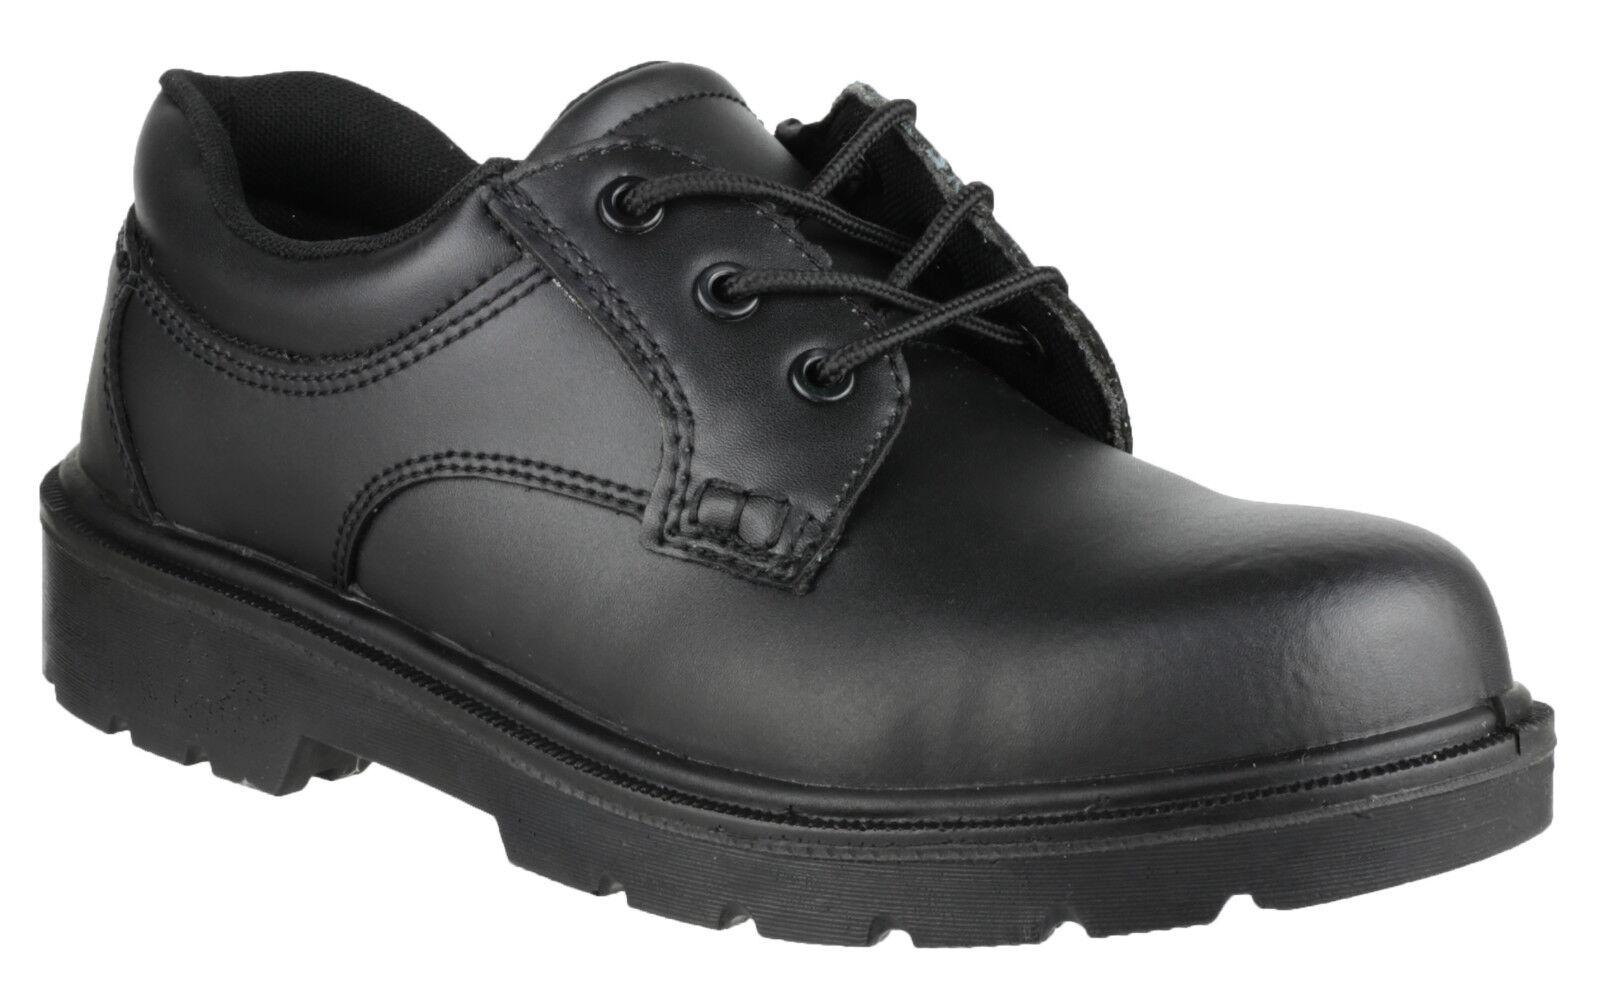 Amblers FS41 Safety Steel Toe Cap Mens Boys Gibson Industrial Work UK4-15